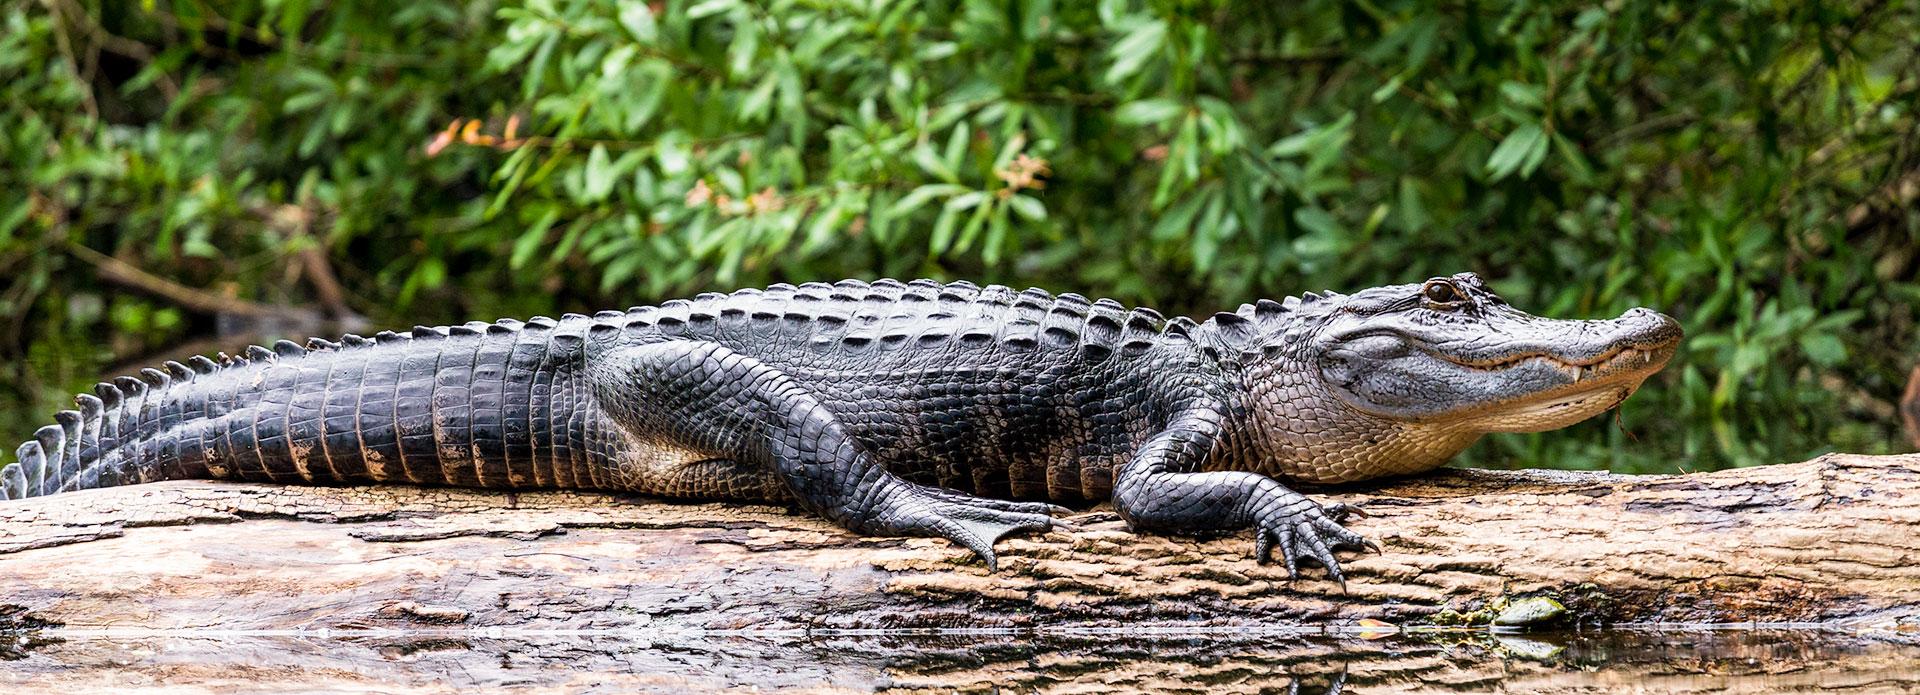 Gatorland at Orlando, Florida Resort